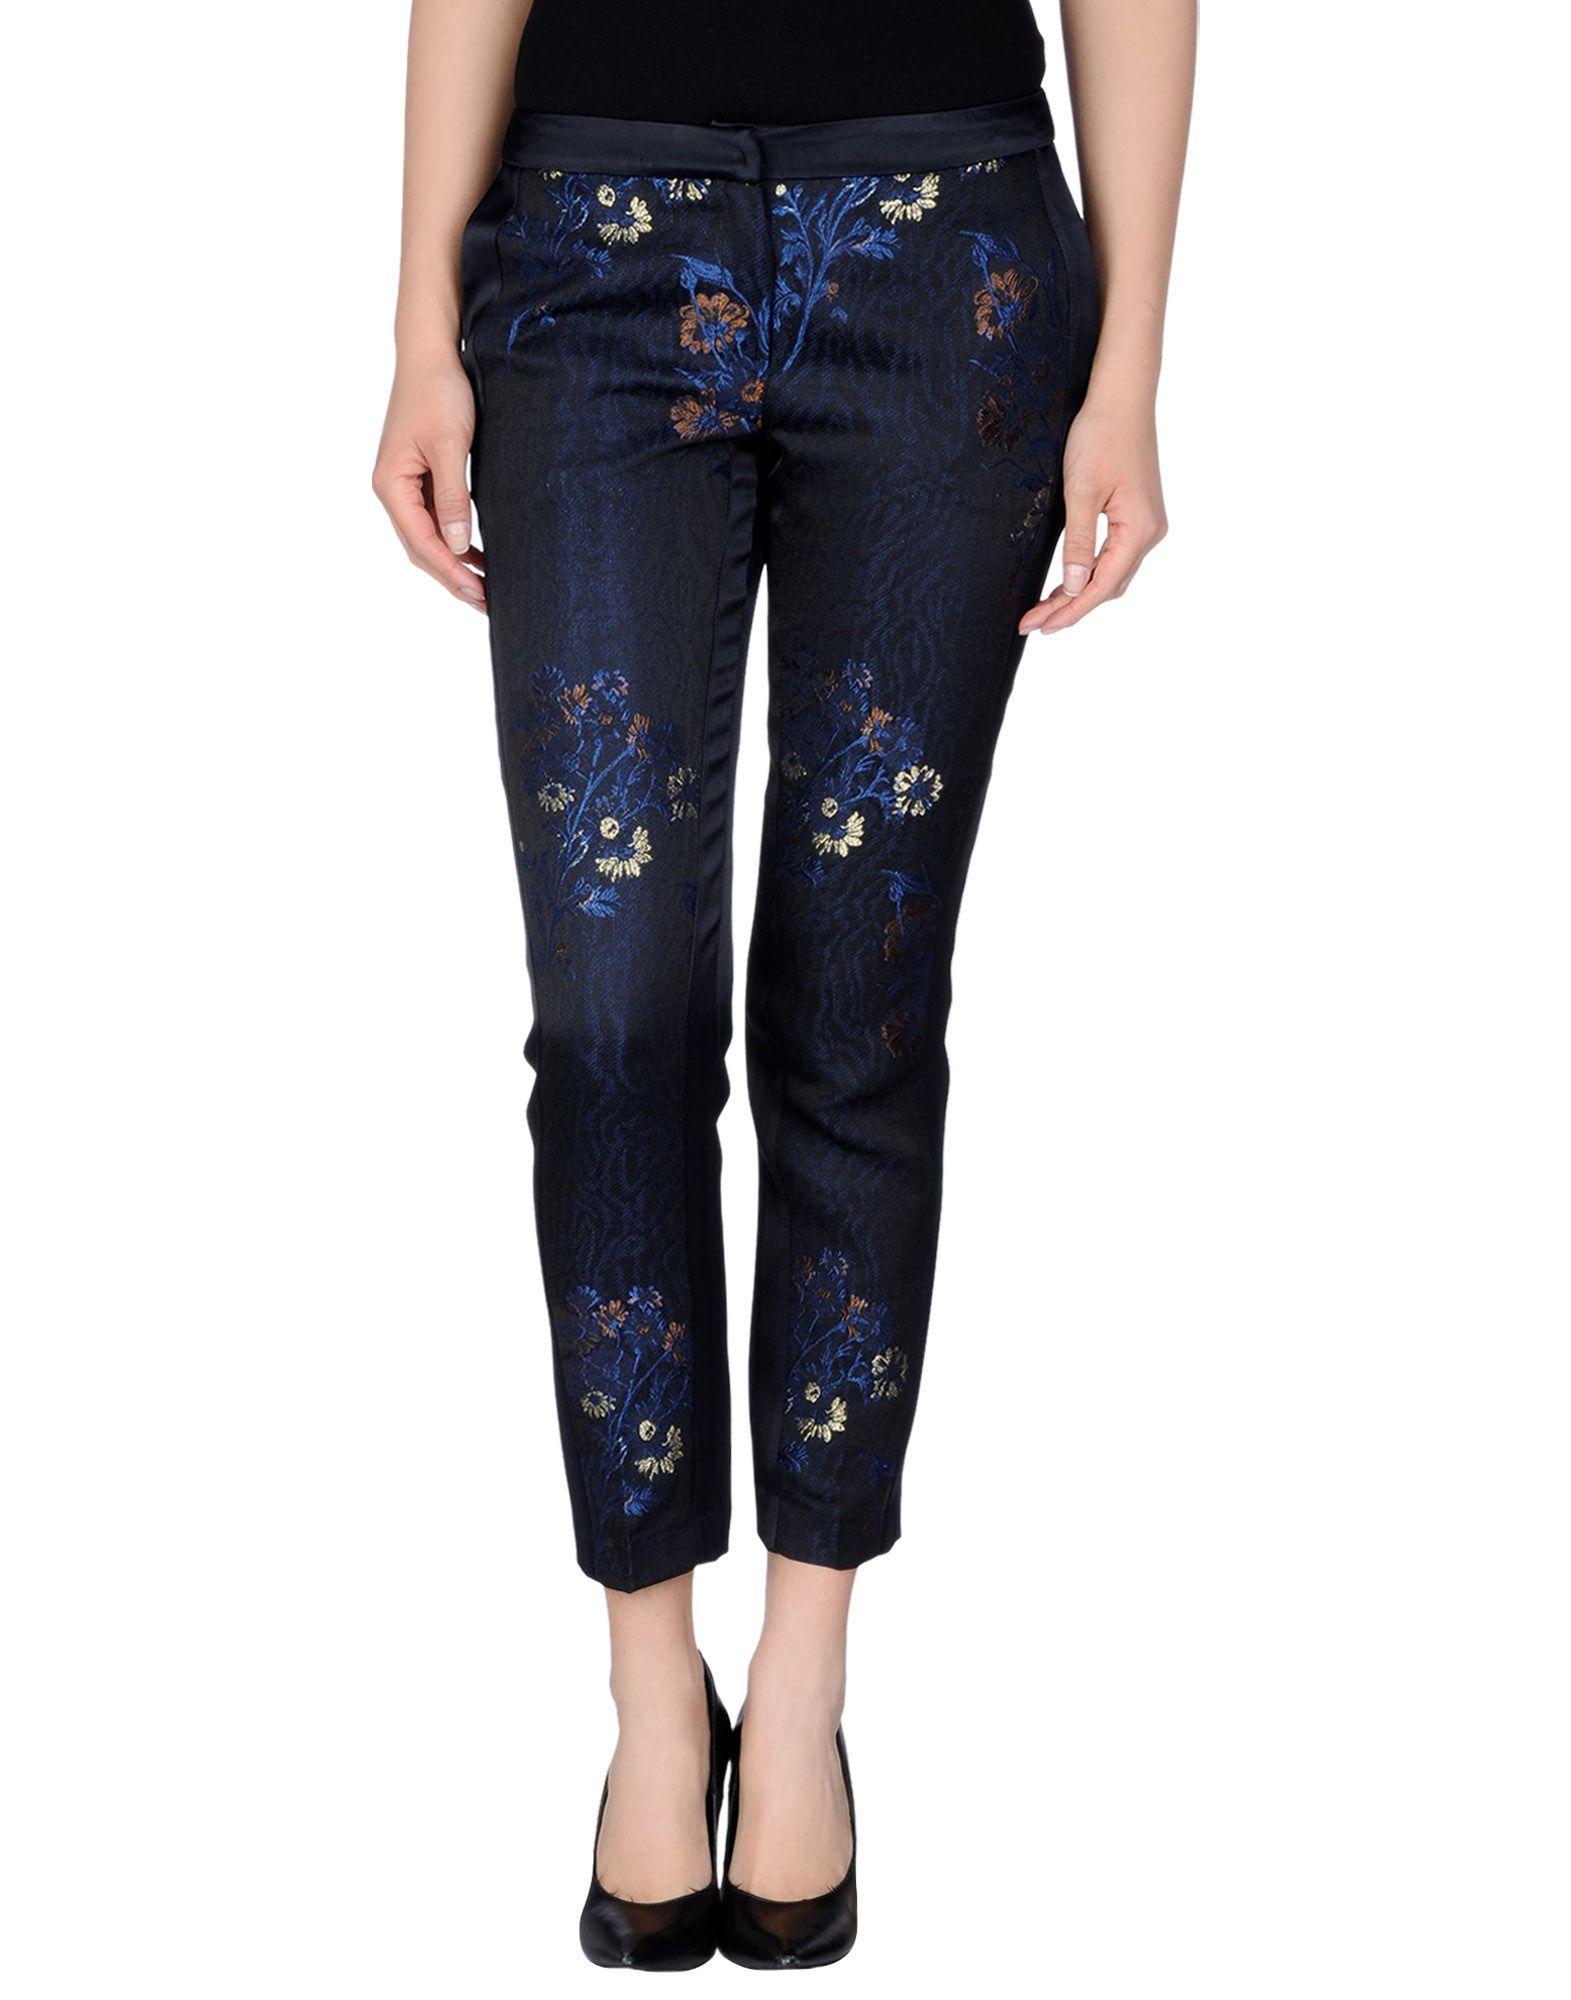 http://cdnc.lystit.com/photos/2c62-2014/05/23/jucca-blue-casual-pants-product-1-20185967-0-916788626-normal.jpeg